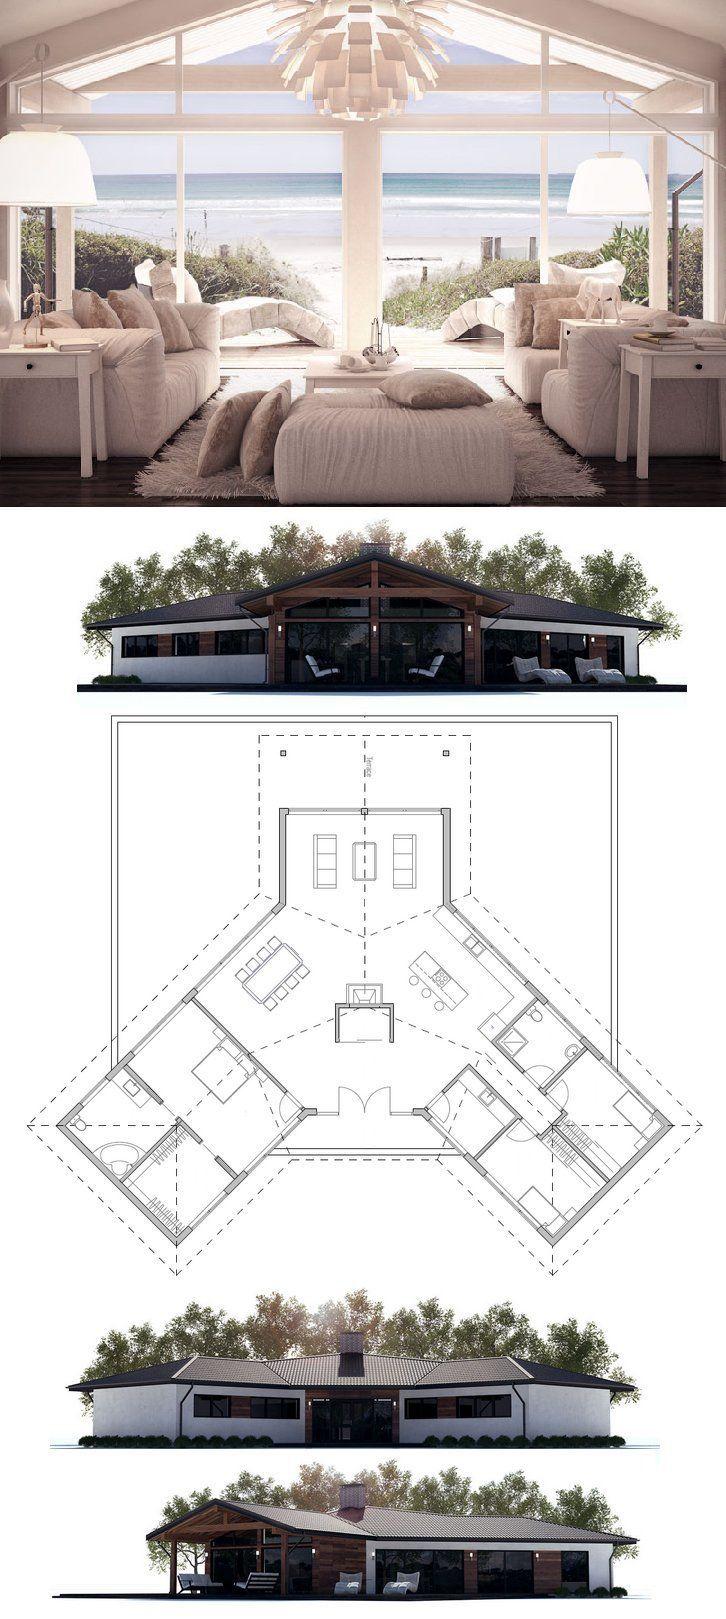 DesertRose,;,nice design,;,